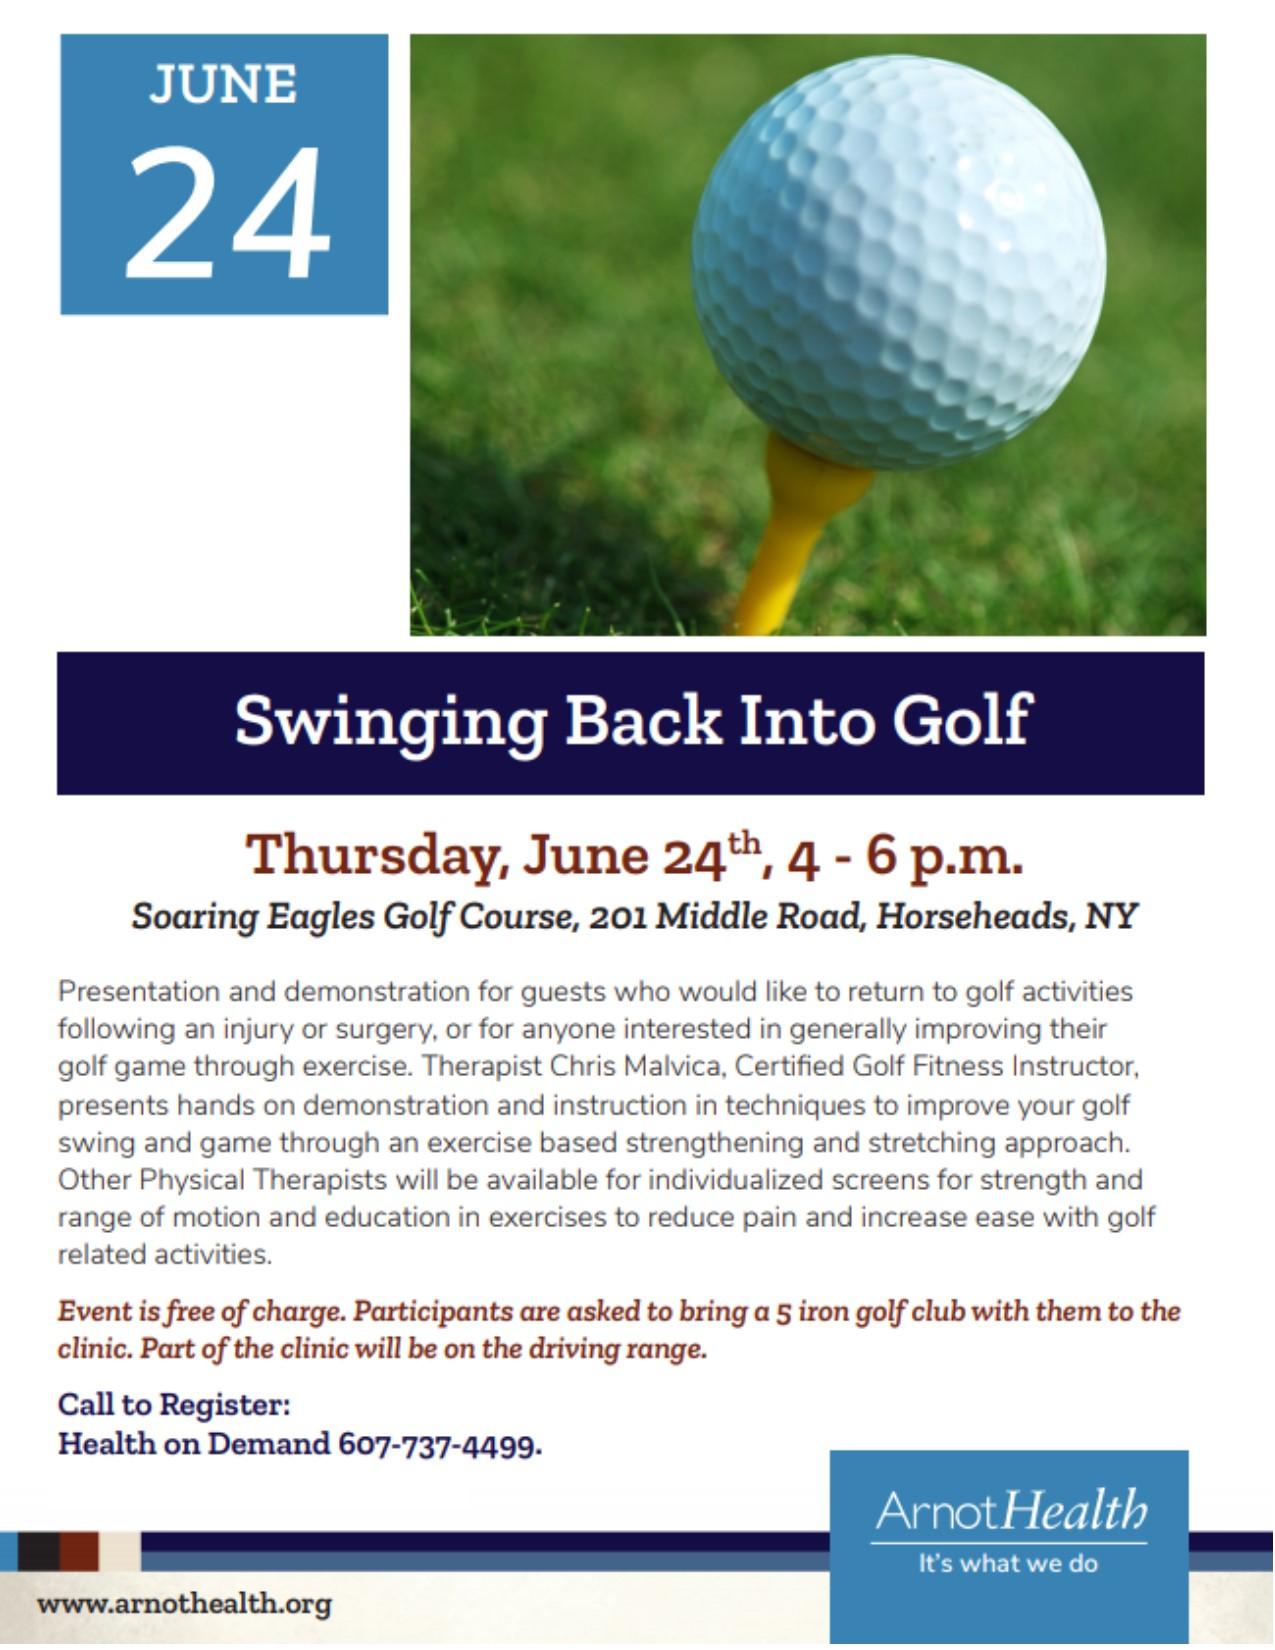 Swinging Back Into Golf